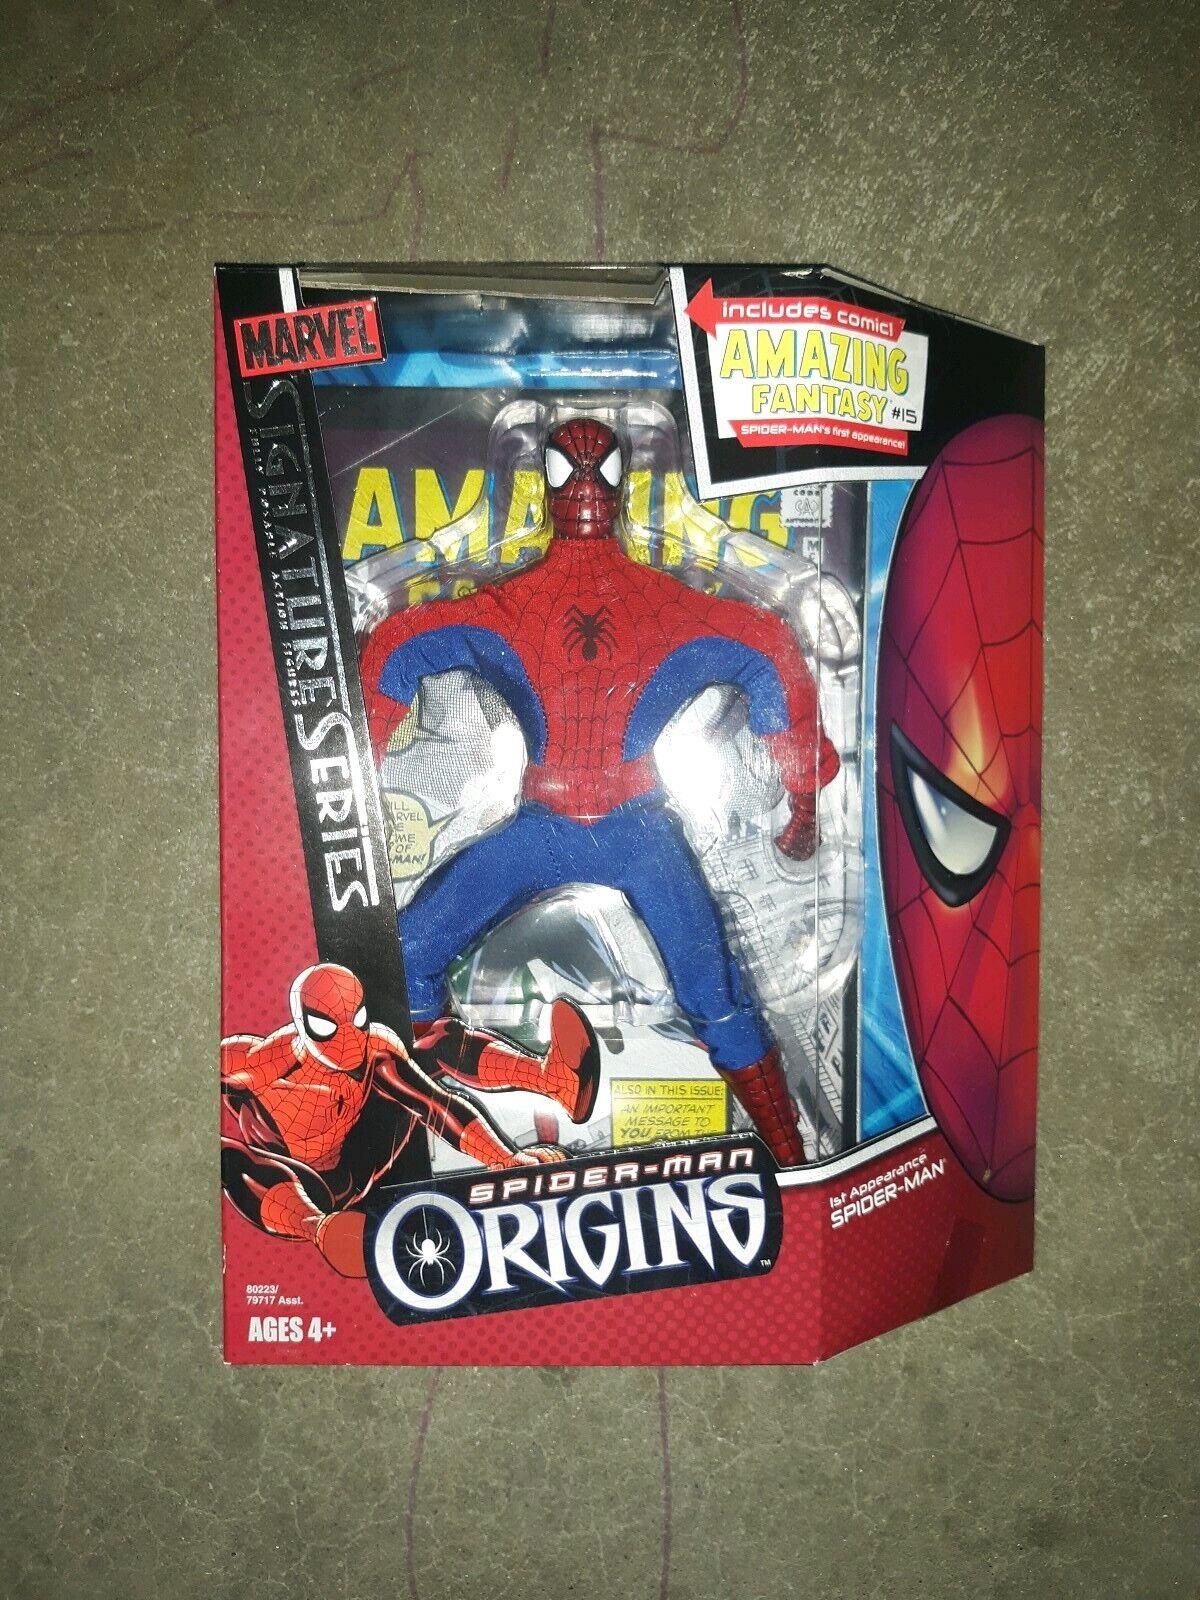 2006 Hasbro SPIDERMAN Origins Signature Series MIB MIB MIB MOC Amazing Fantasy 15 Comic 24a442